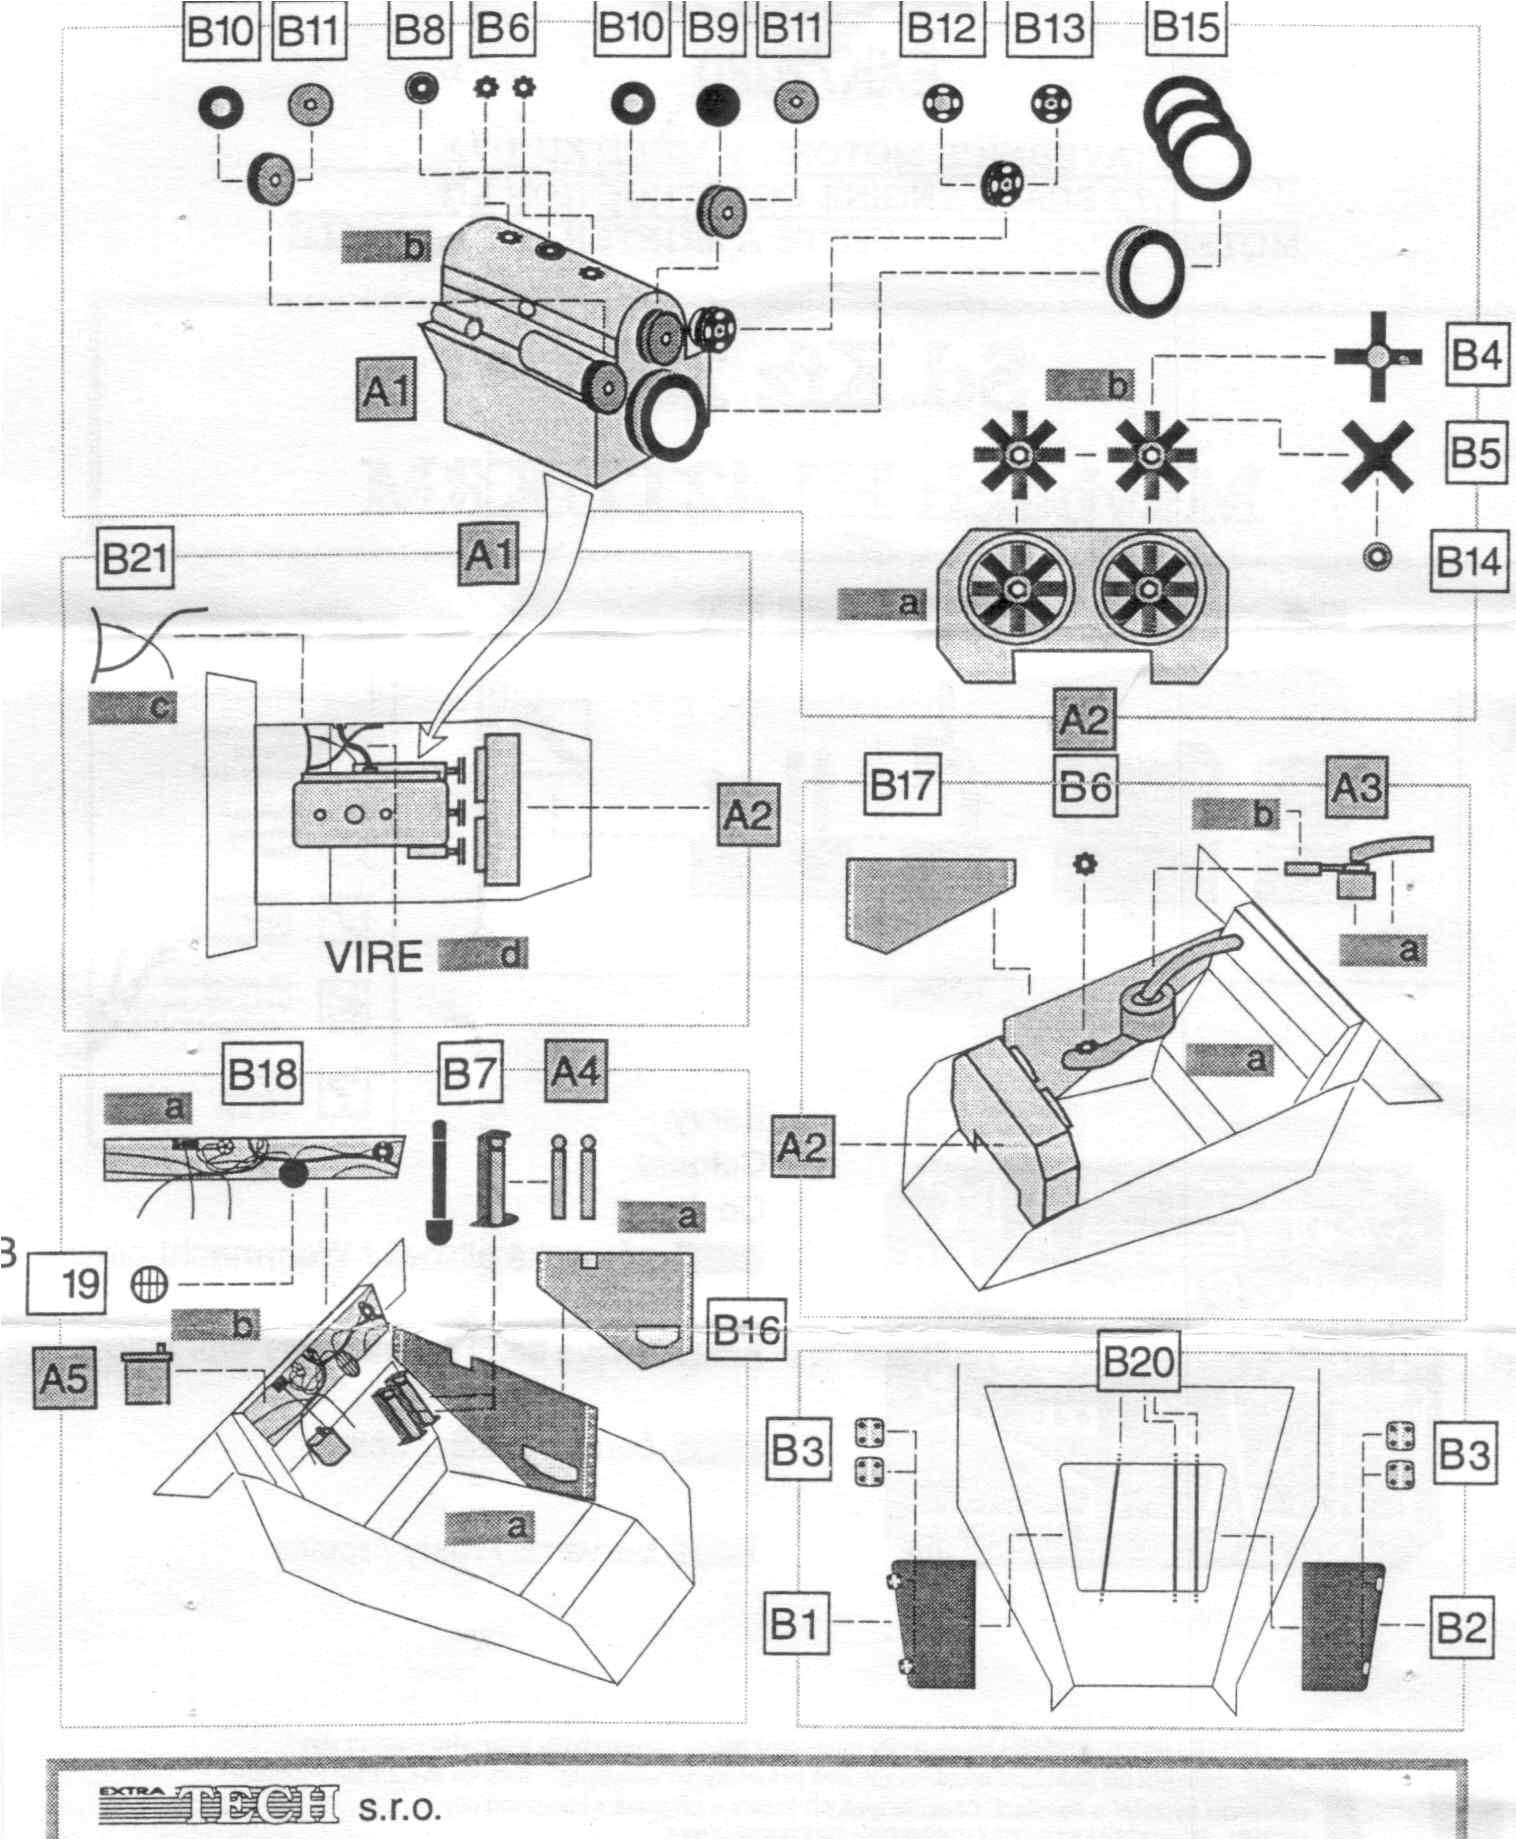 Extratech Exk Maybach Hl42tukrrm Sd Kfz 251 Engine Set